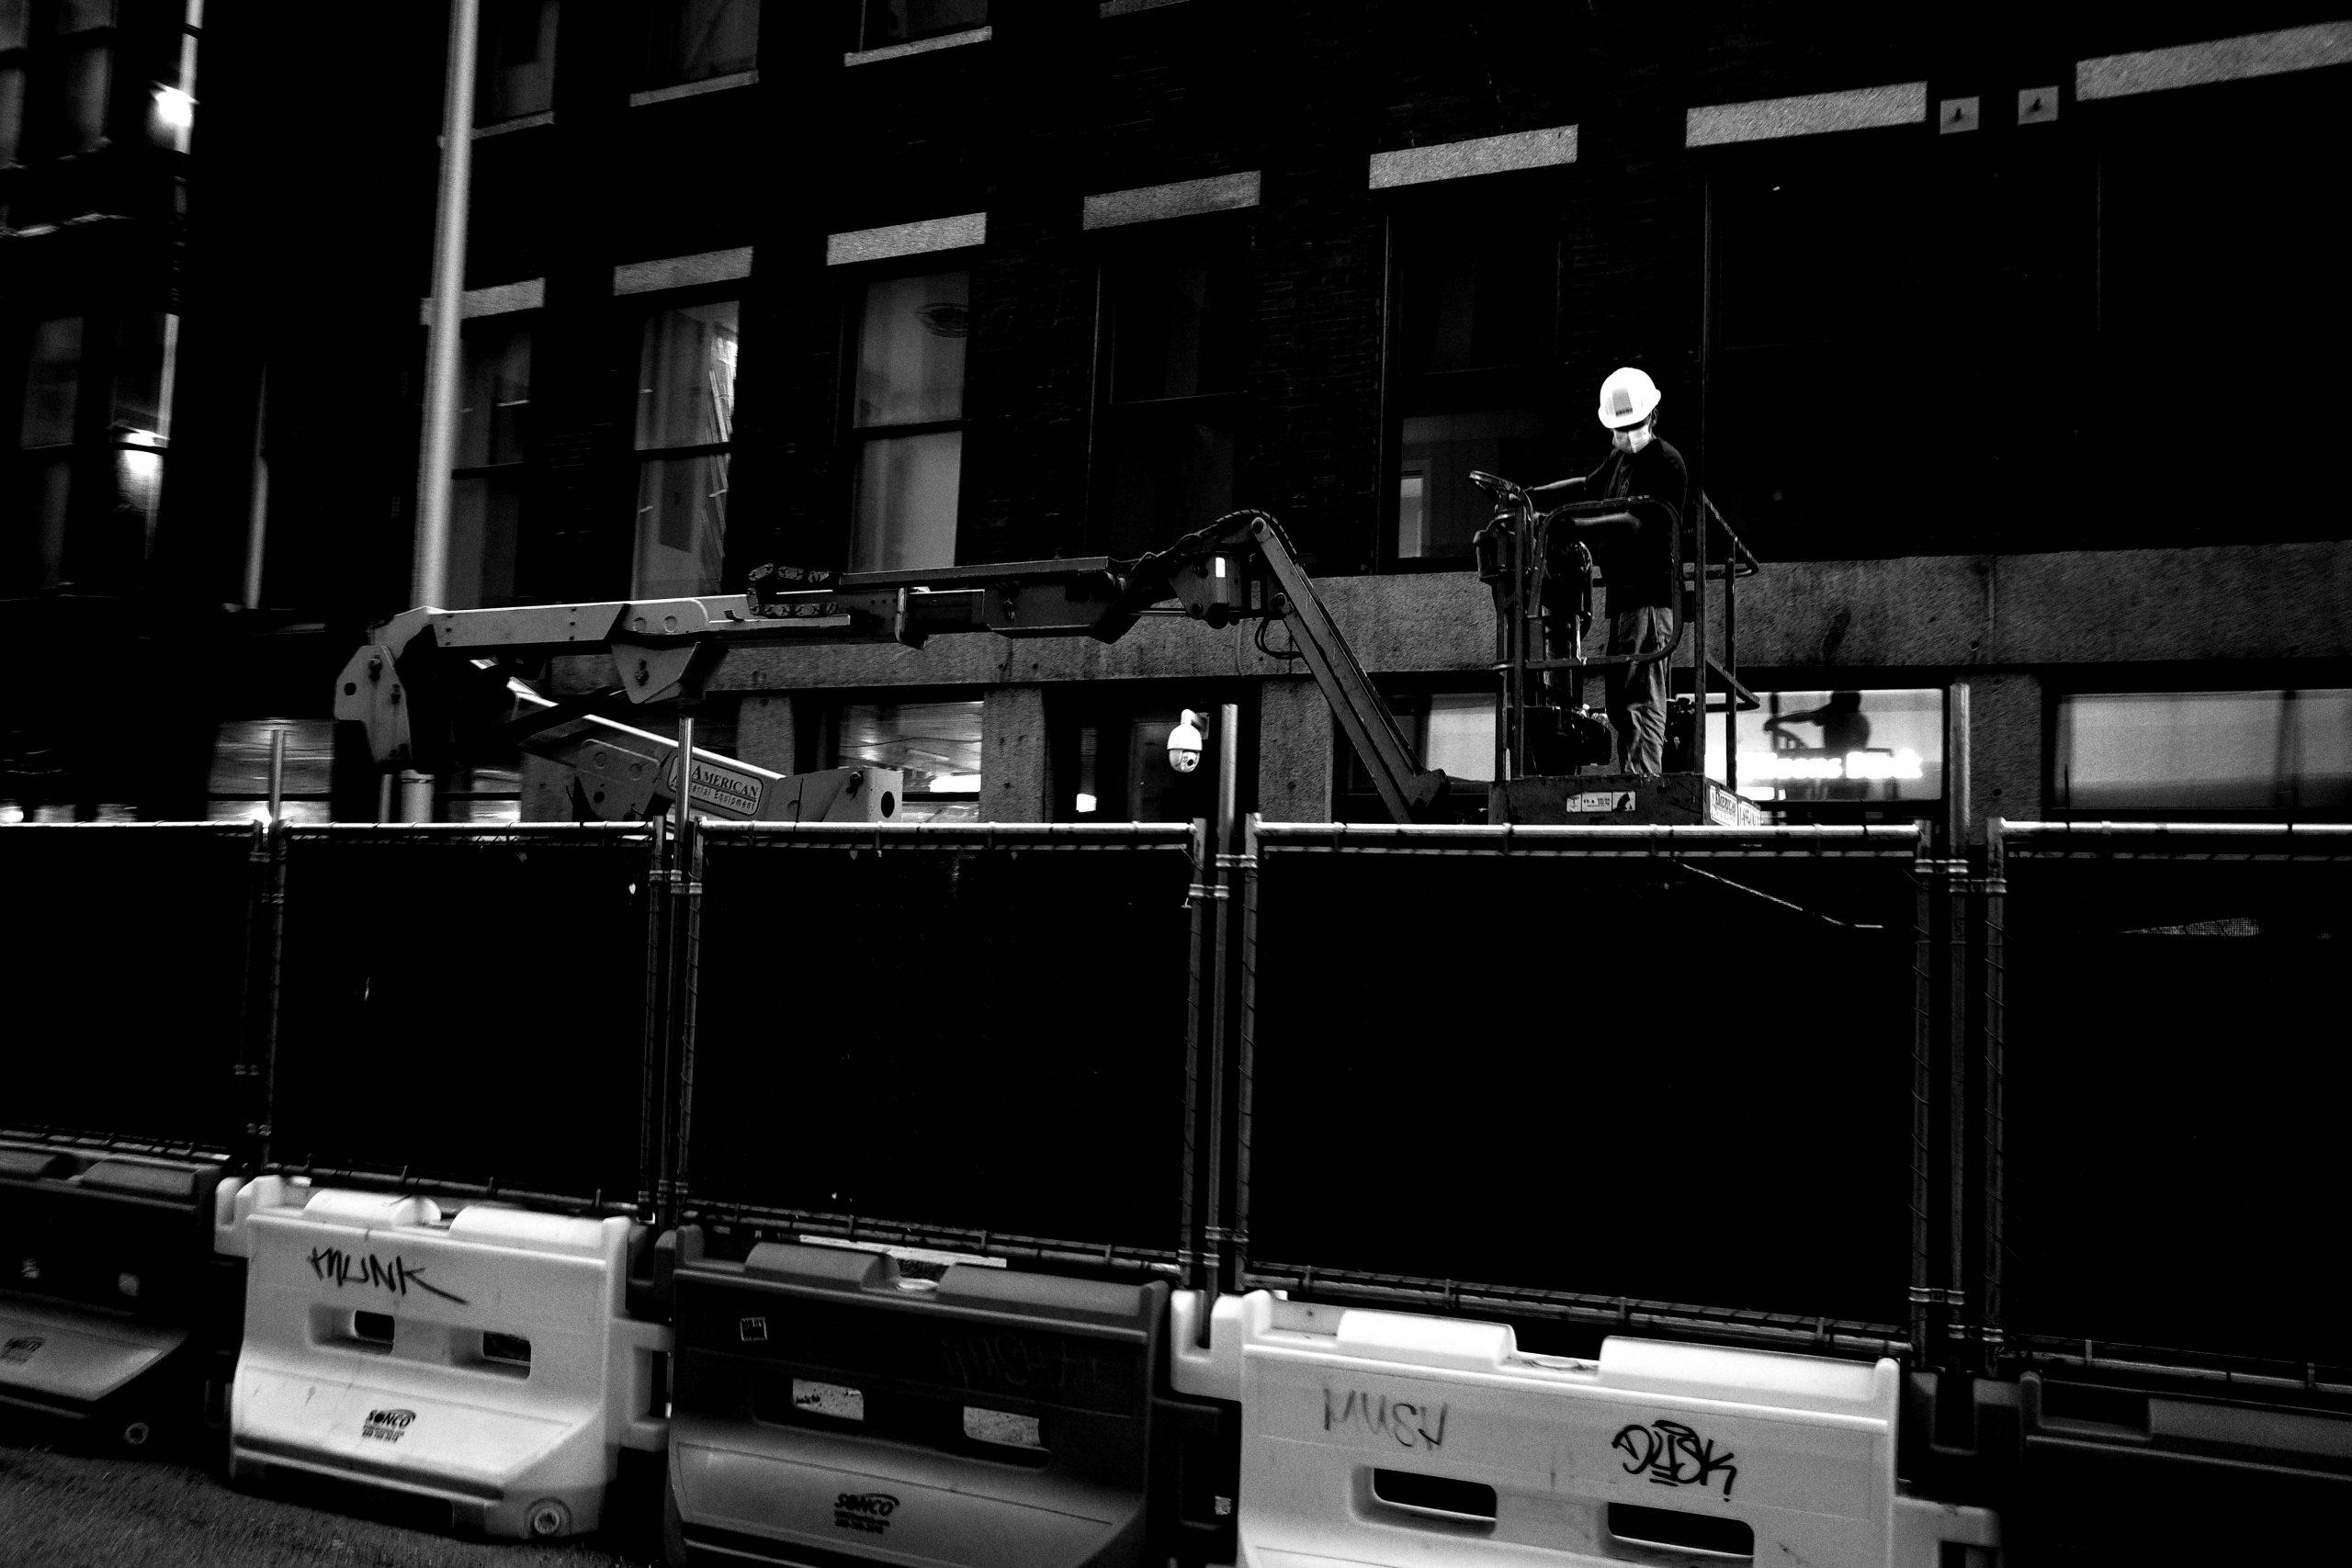 street black and white Eric Kim